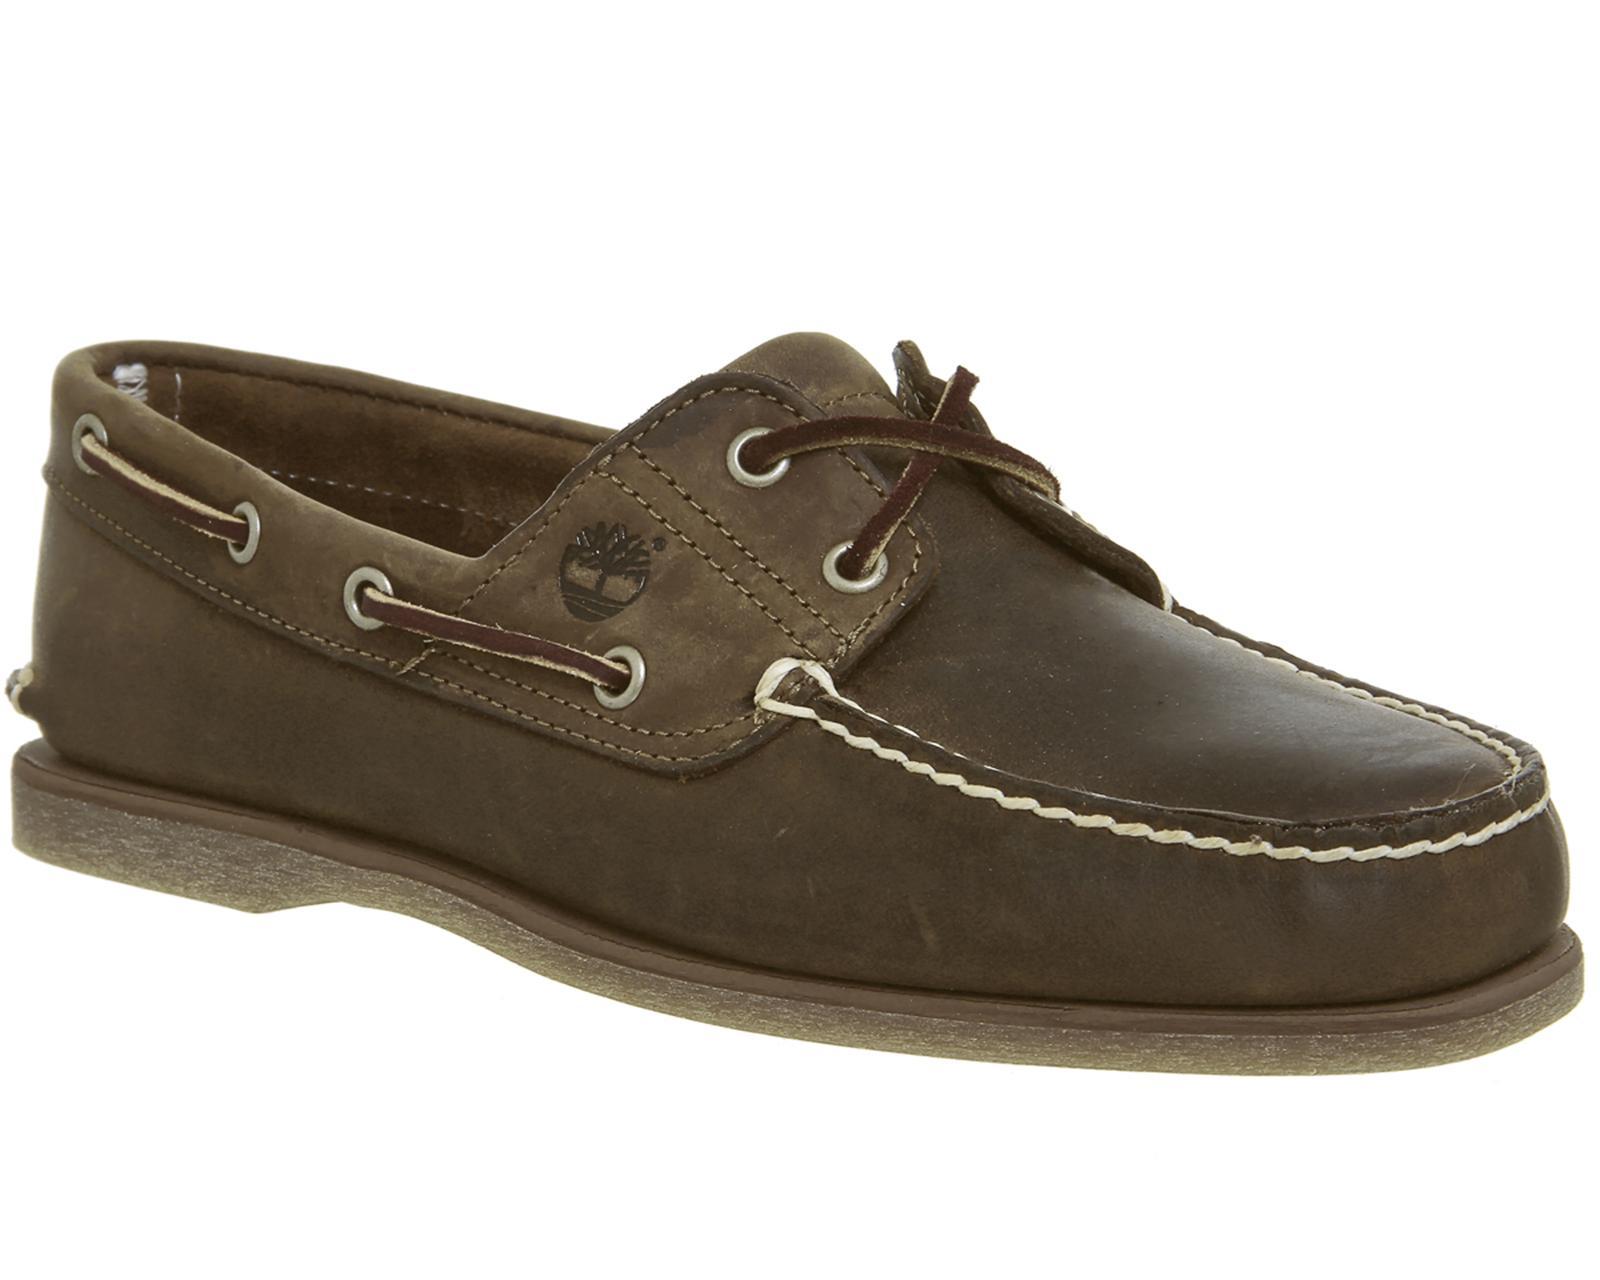 Timberland Boots \u0026 Shoes   Men, Women